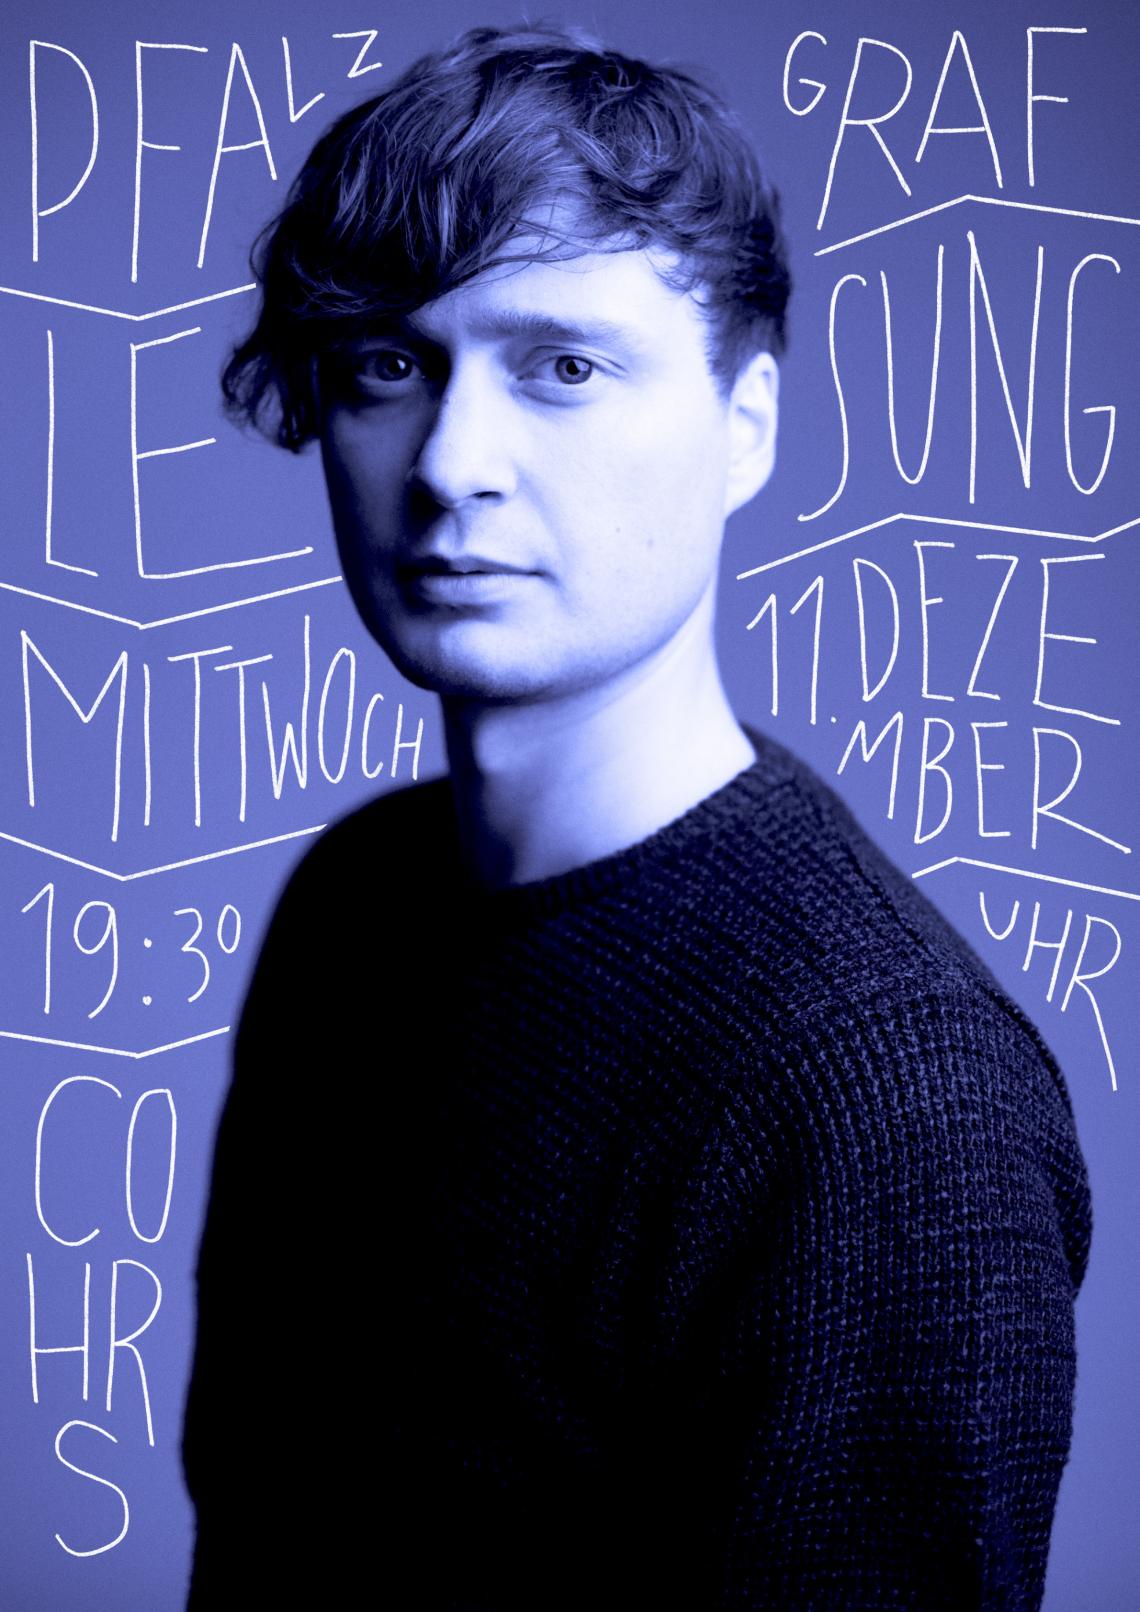 Plakat_Lesung_Pfalzgraf